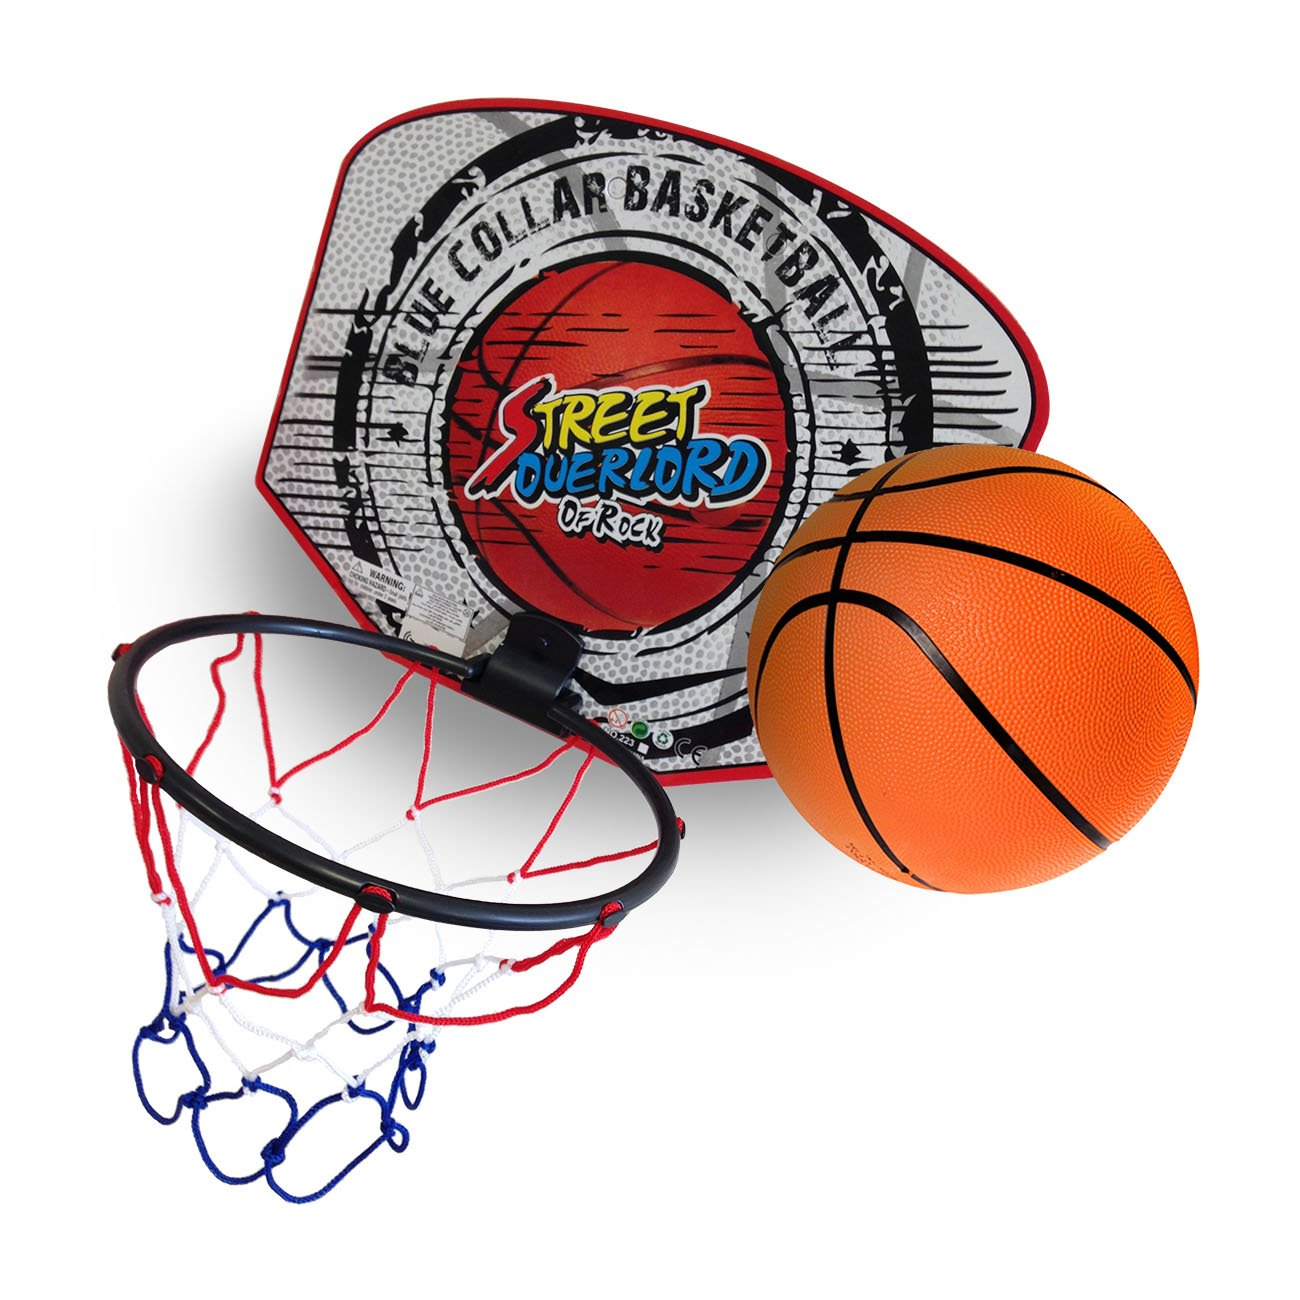 twitfish mini basketball game set portable basket ball hoop office kids room. Black Bedroom Furniture Sets. Home Design Ideas